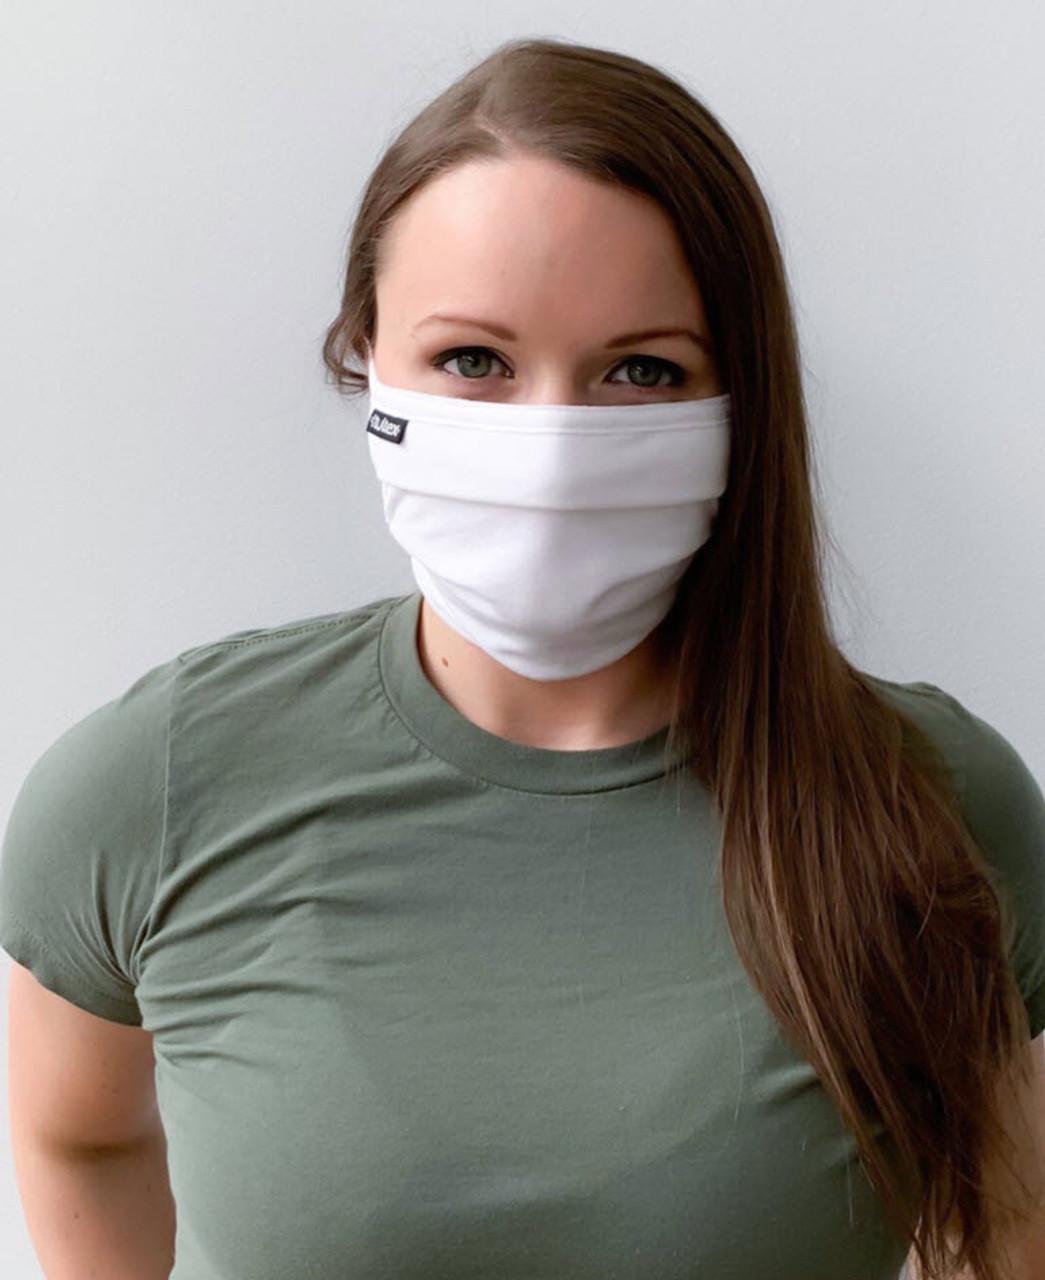 Tultex Soft Cotton Face Cover | 100% USA Cotton | 201079